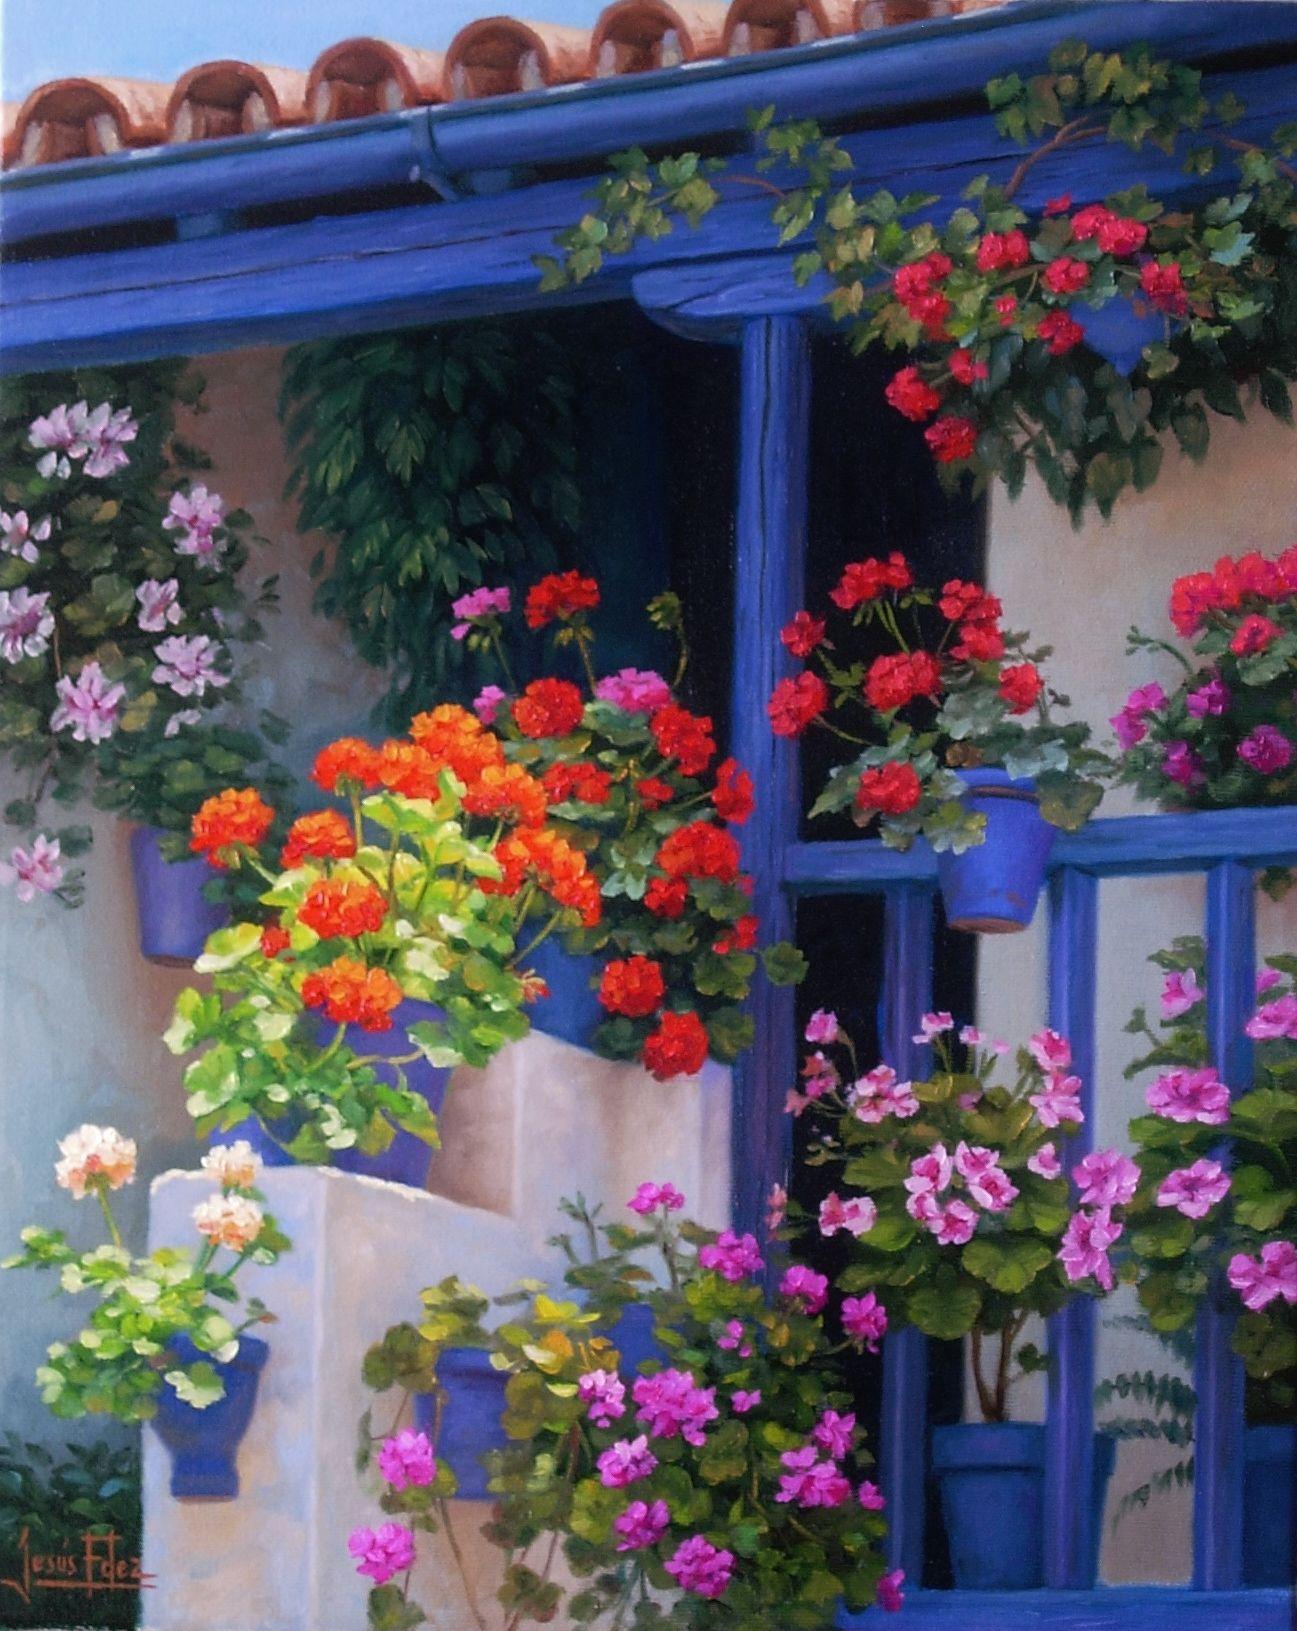 Rinc n de patio cordob s patios andaluces pinterest - Patios andaluces decoracion ...